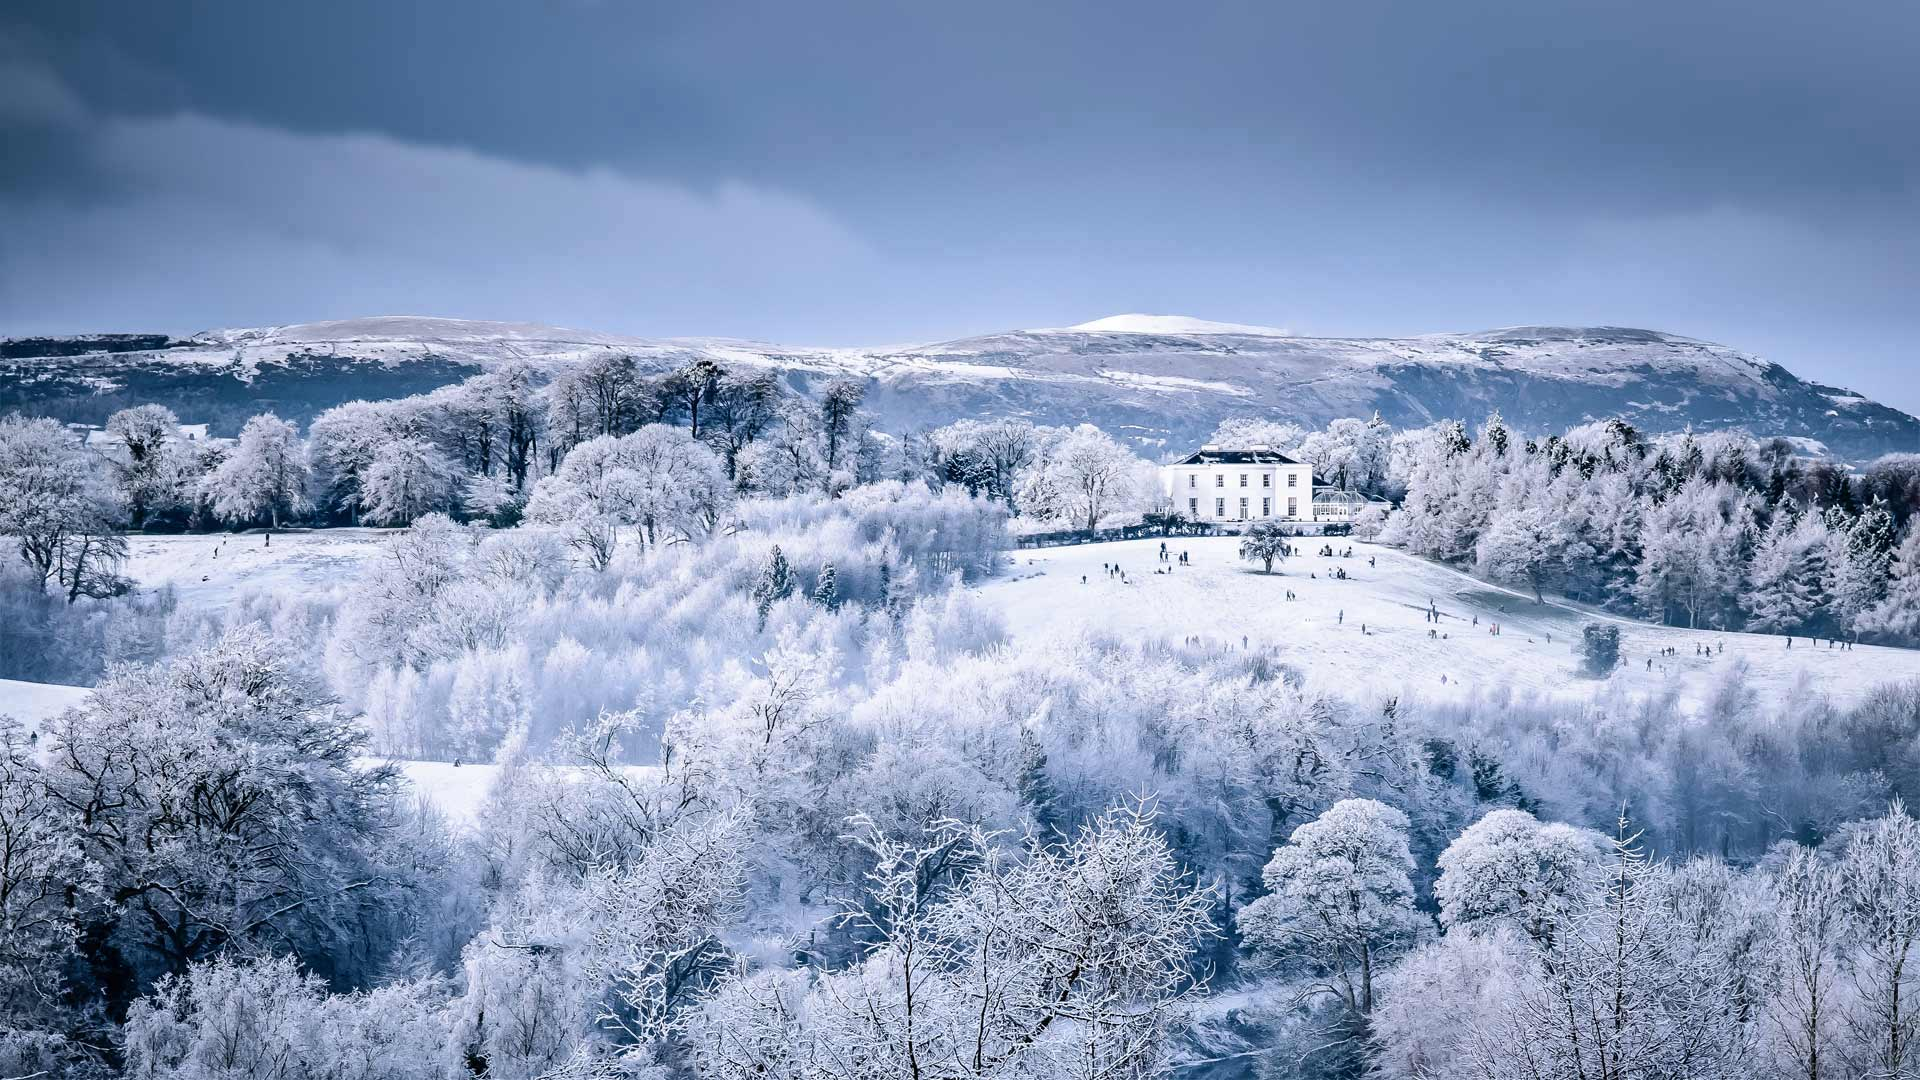 Barnett Demesne公园中在白雪覆盖的山坡上玩耍的一家,北爱尔兰贝尔法斯特